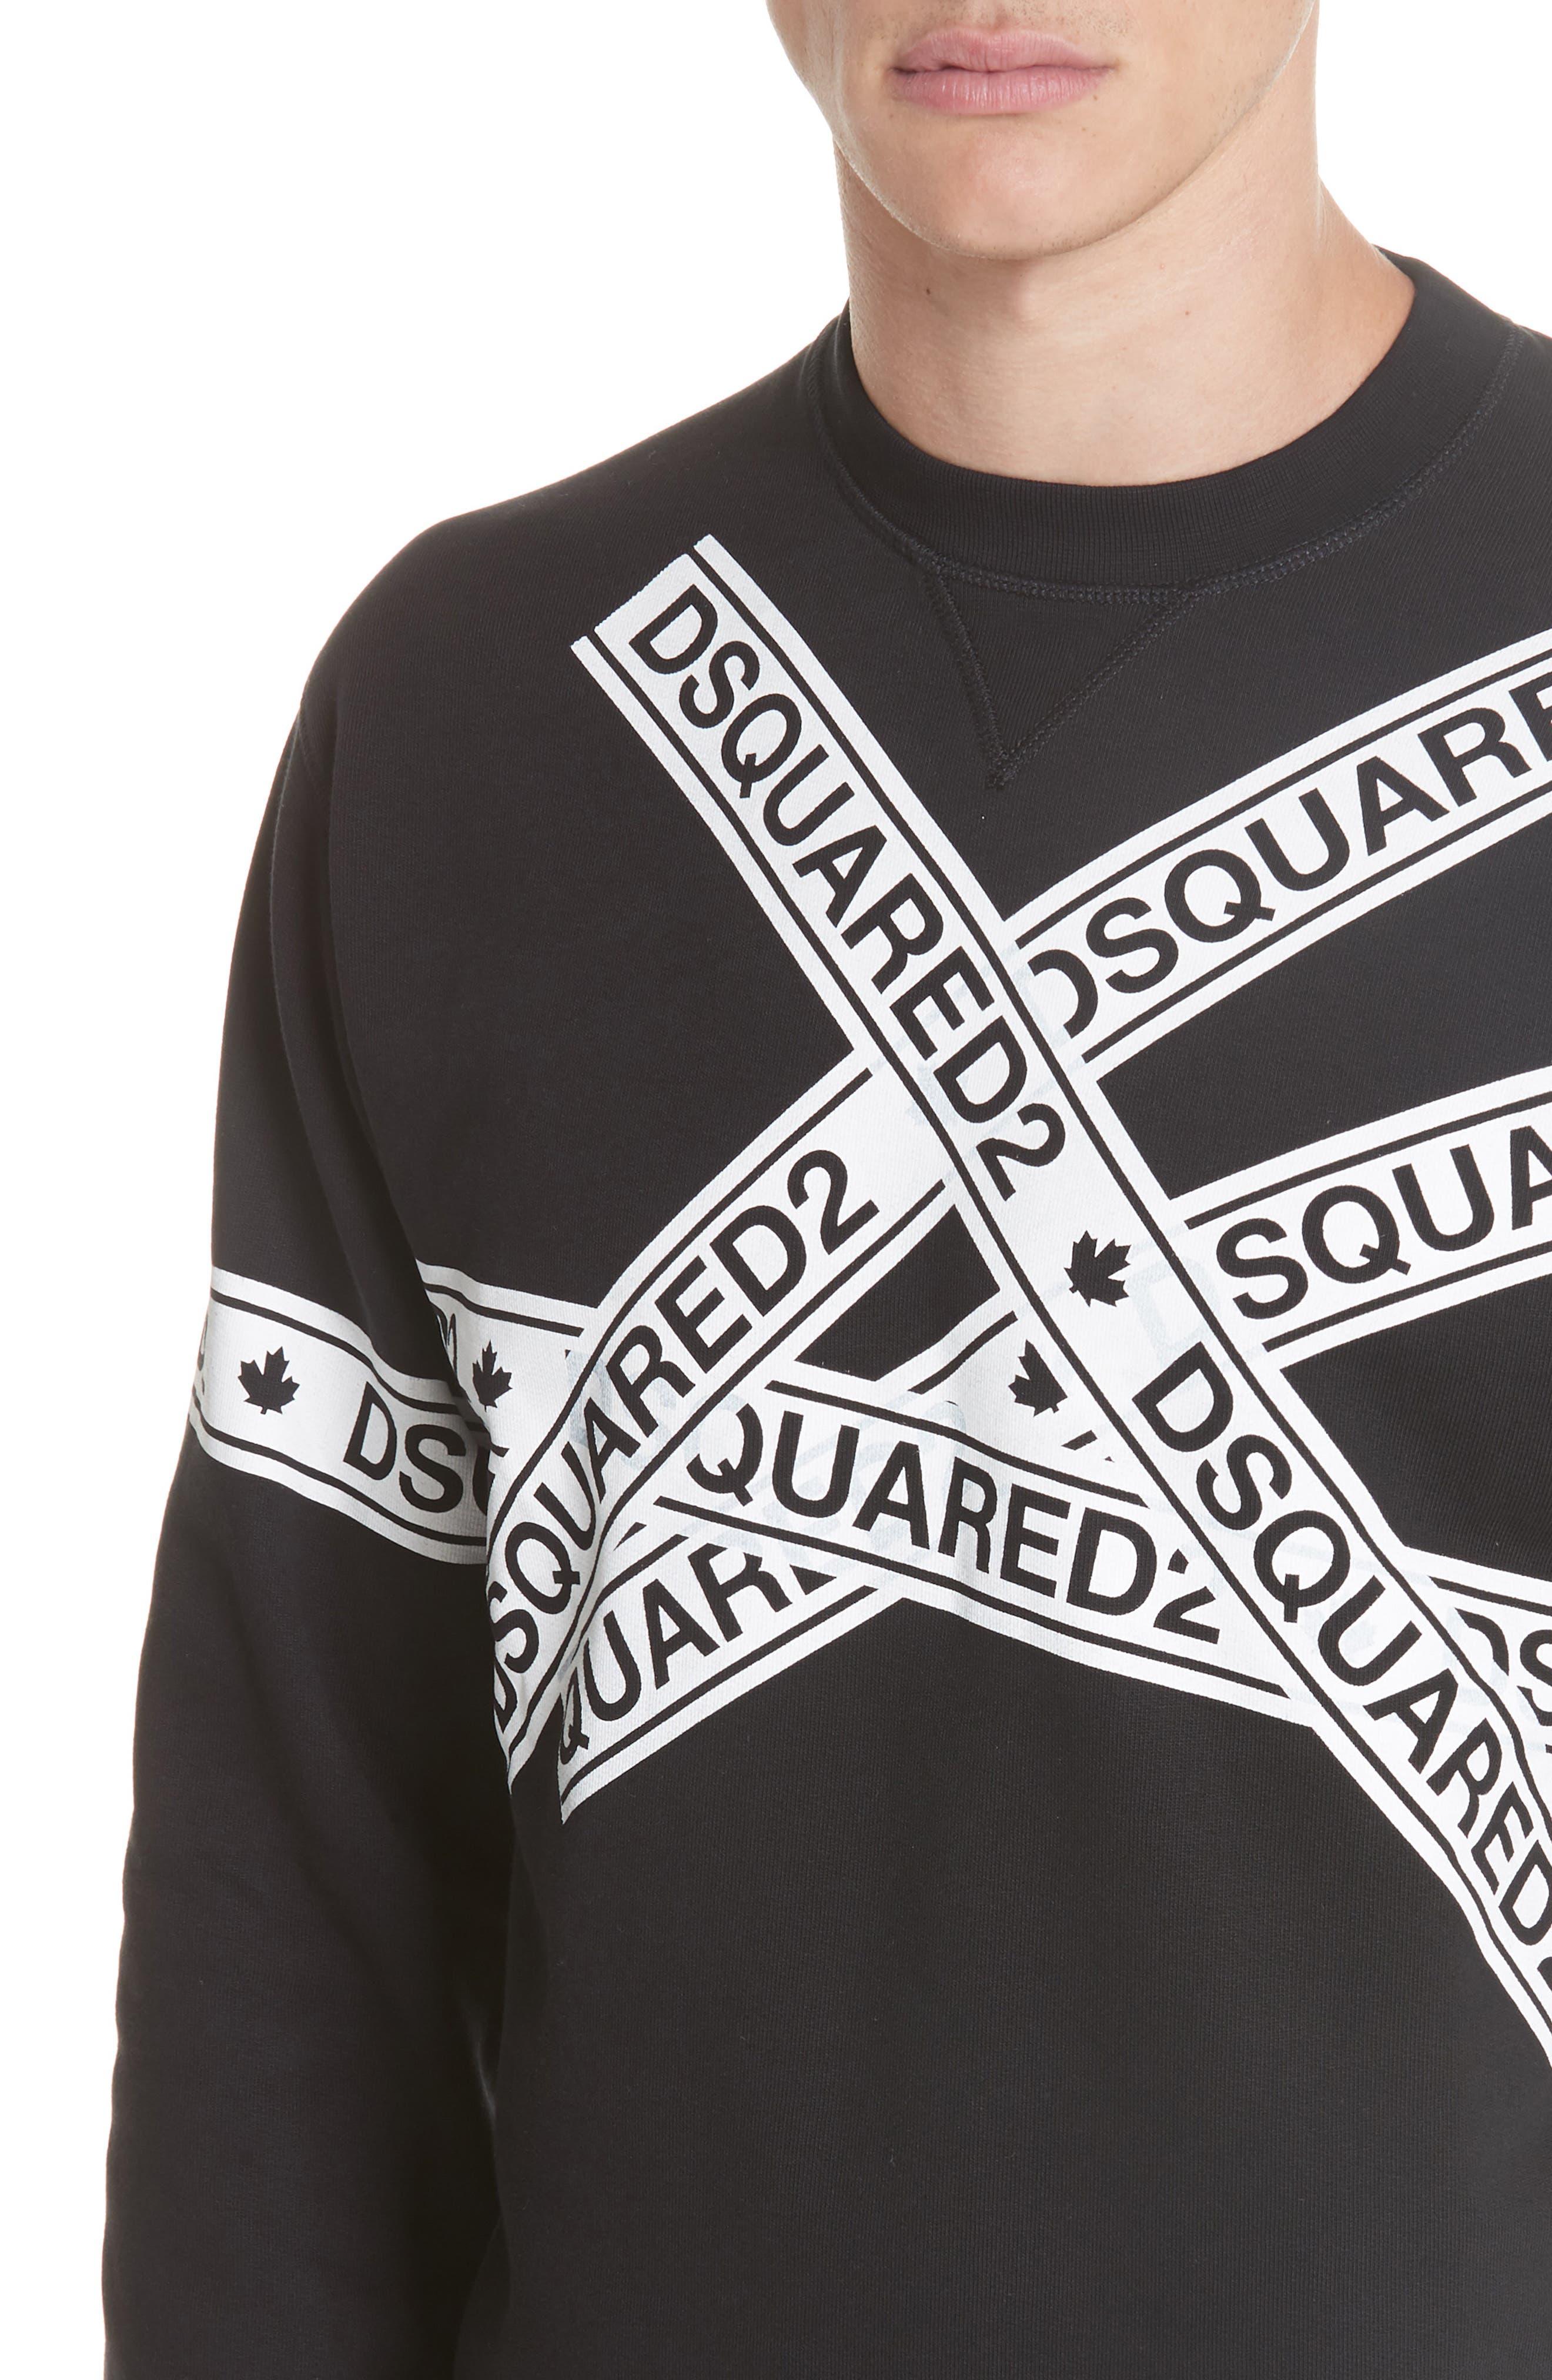 Caution Logo Print Sweatshirt,                             Alternate thumbnail 4, color,                             001